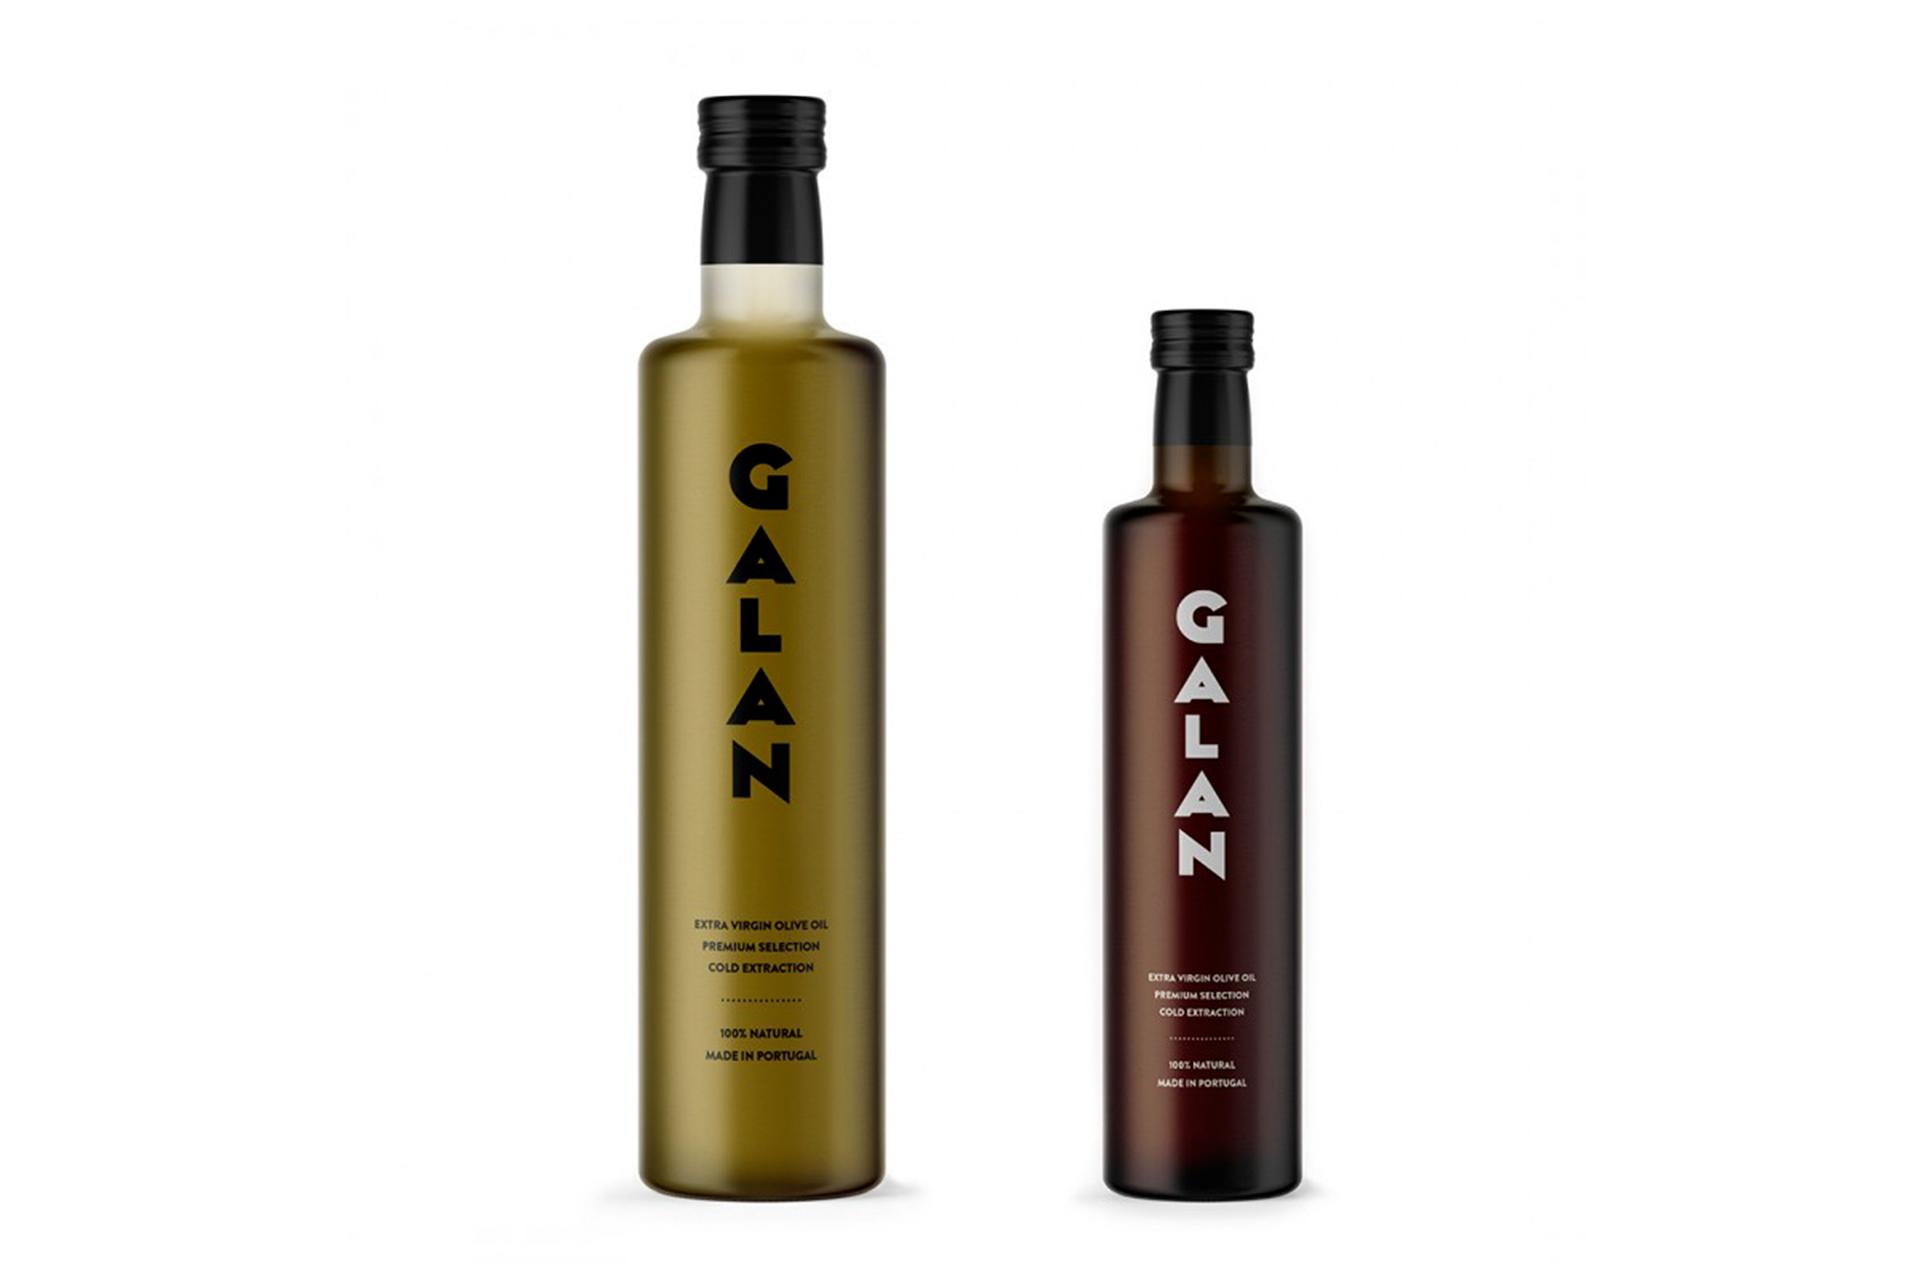 Galan Bottles - DESIGN BY MIGUEL SOEIRO